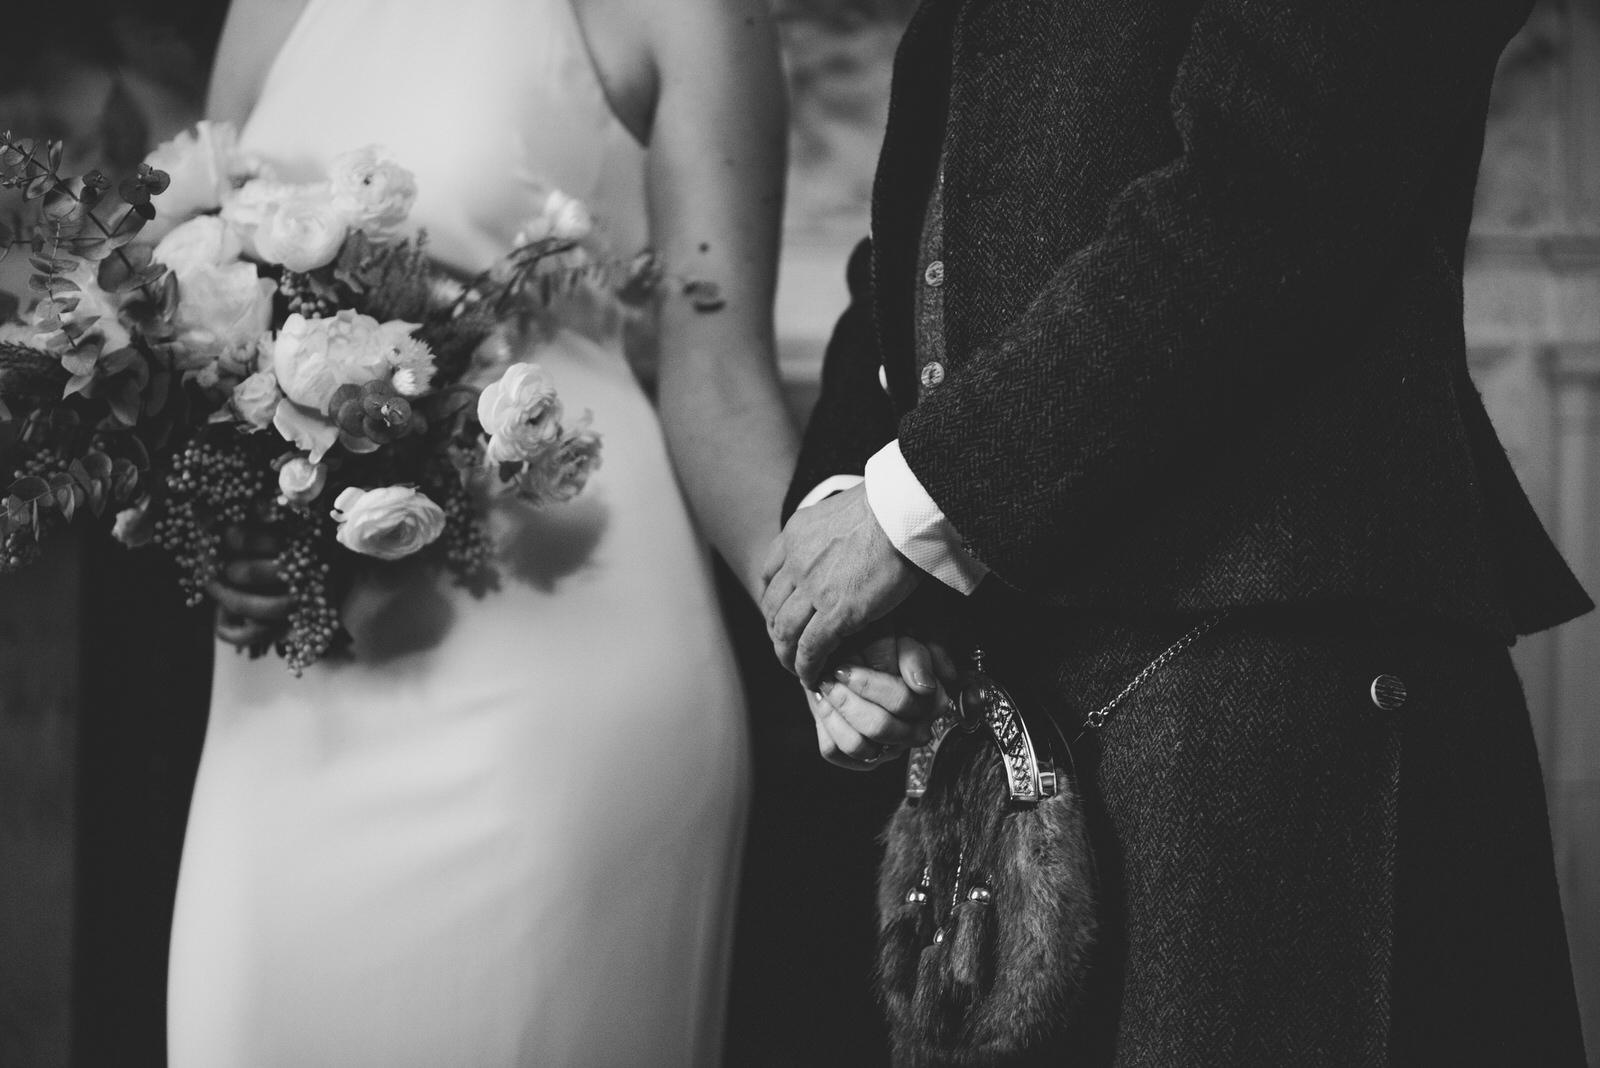 031-COLSTOUN-HOUSE-WEDDING-ALTERNATIVE-WEDDING-PHOTOGRAPHER-GLASGOW-WEDDING-PHOTOGRAPHER-STYLISH-SCOTTISH-WEDDING.JPG